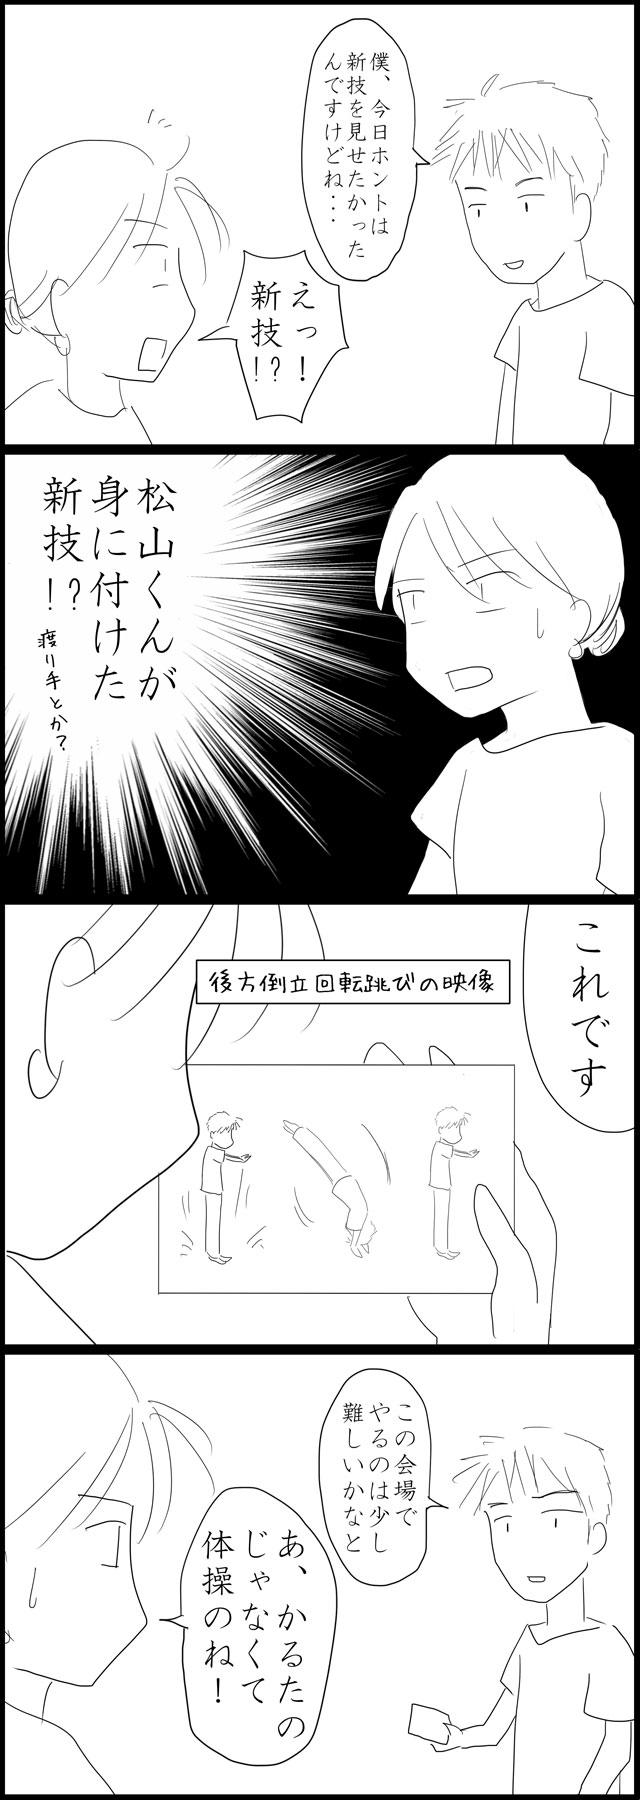 f:id:karutaru:20151018210803j:image:w480